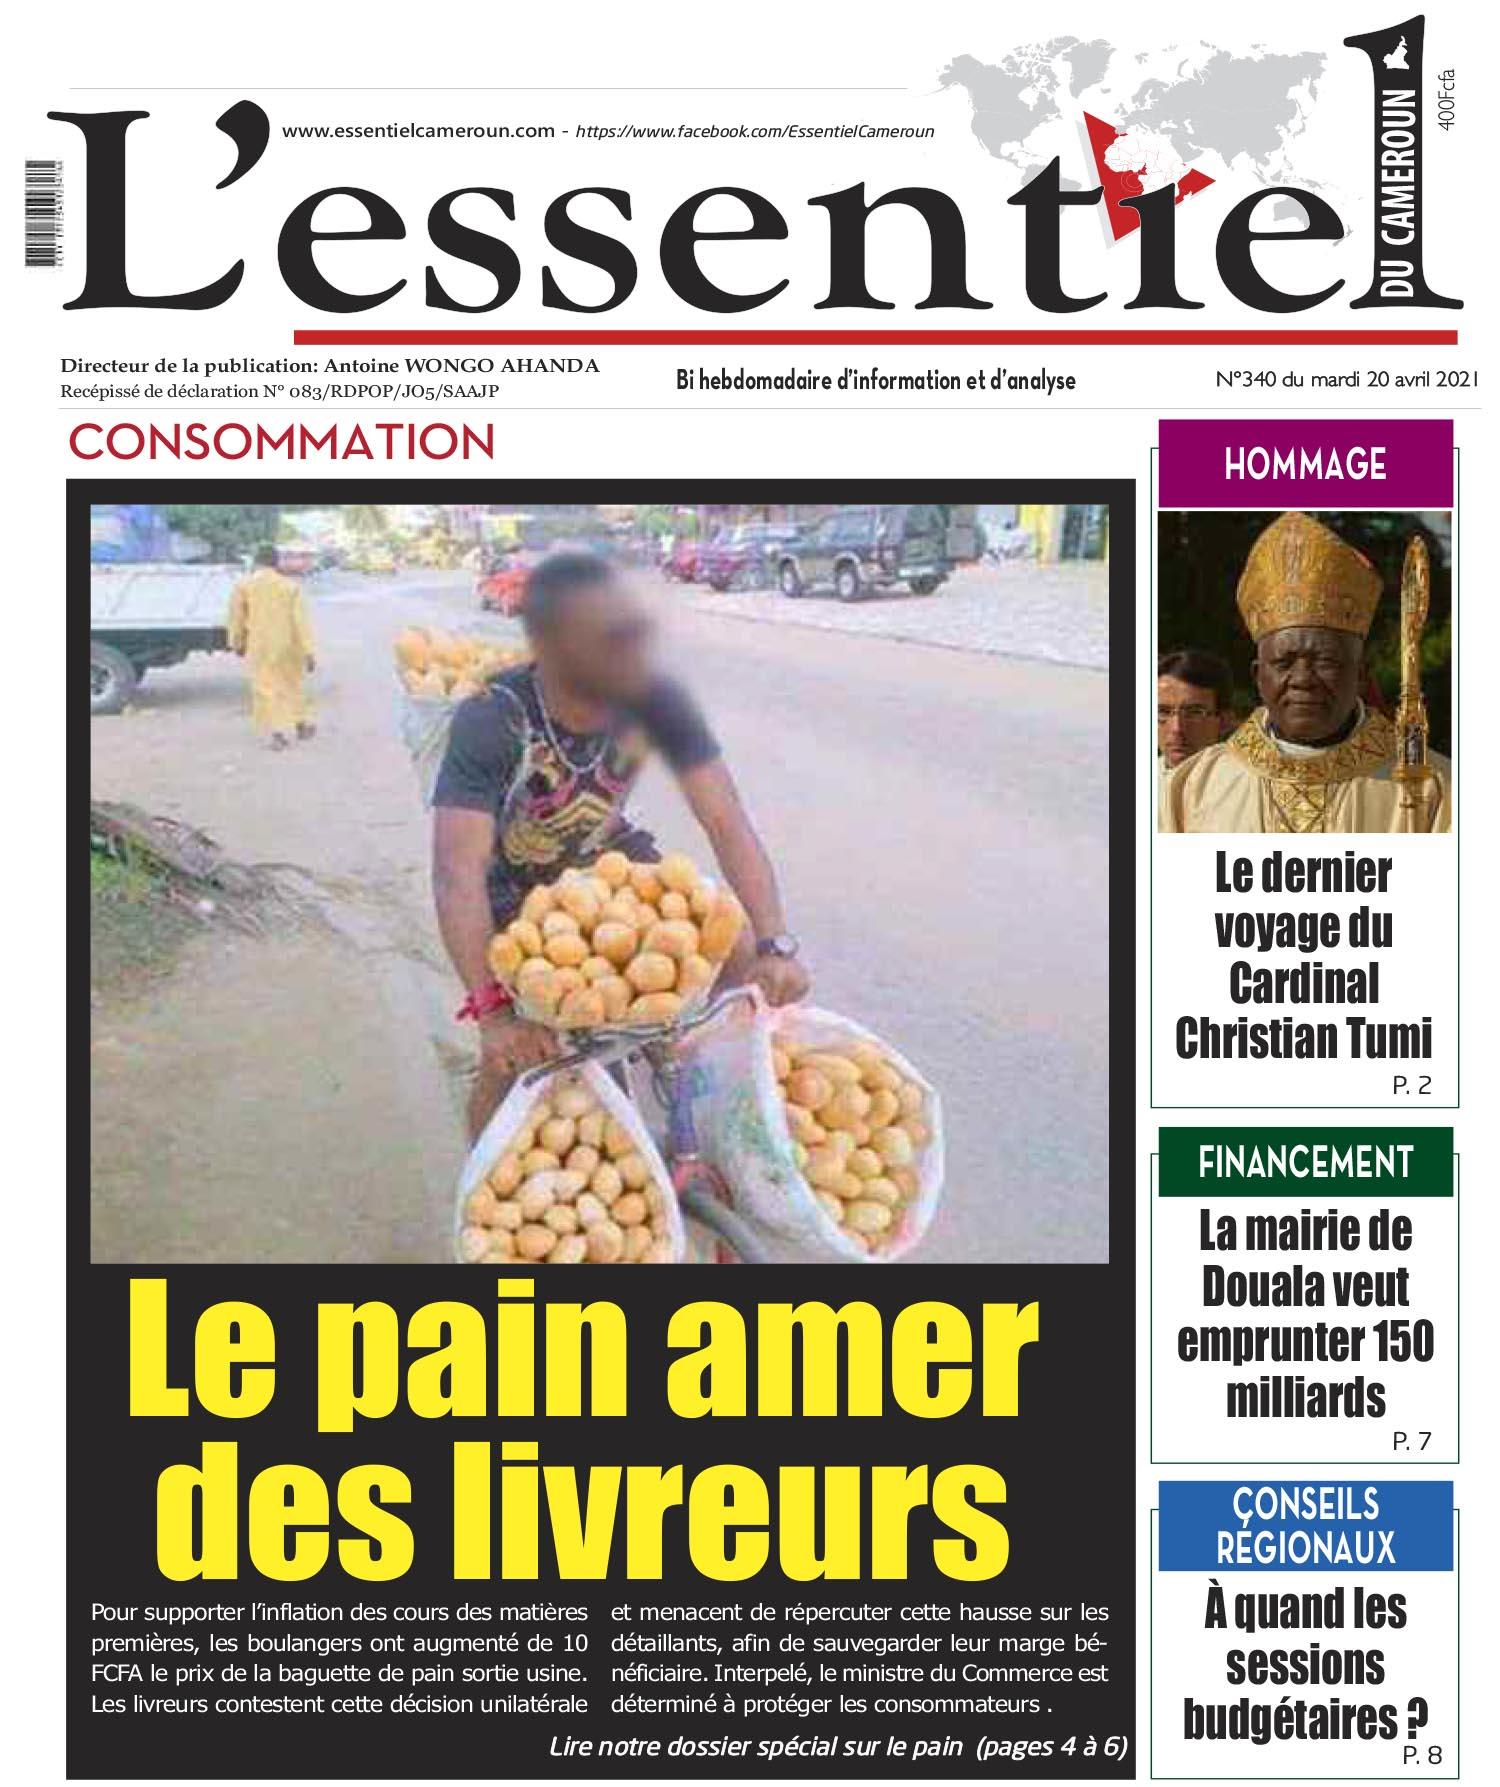 Cover L'Essentiel du Cameroun - 340